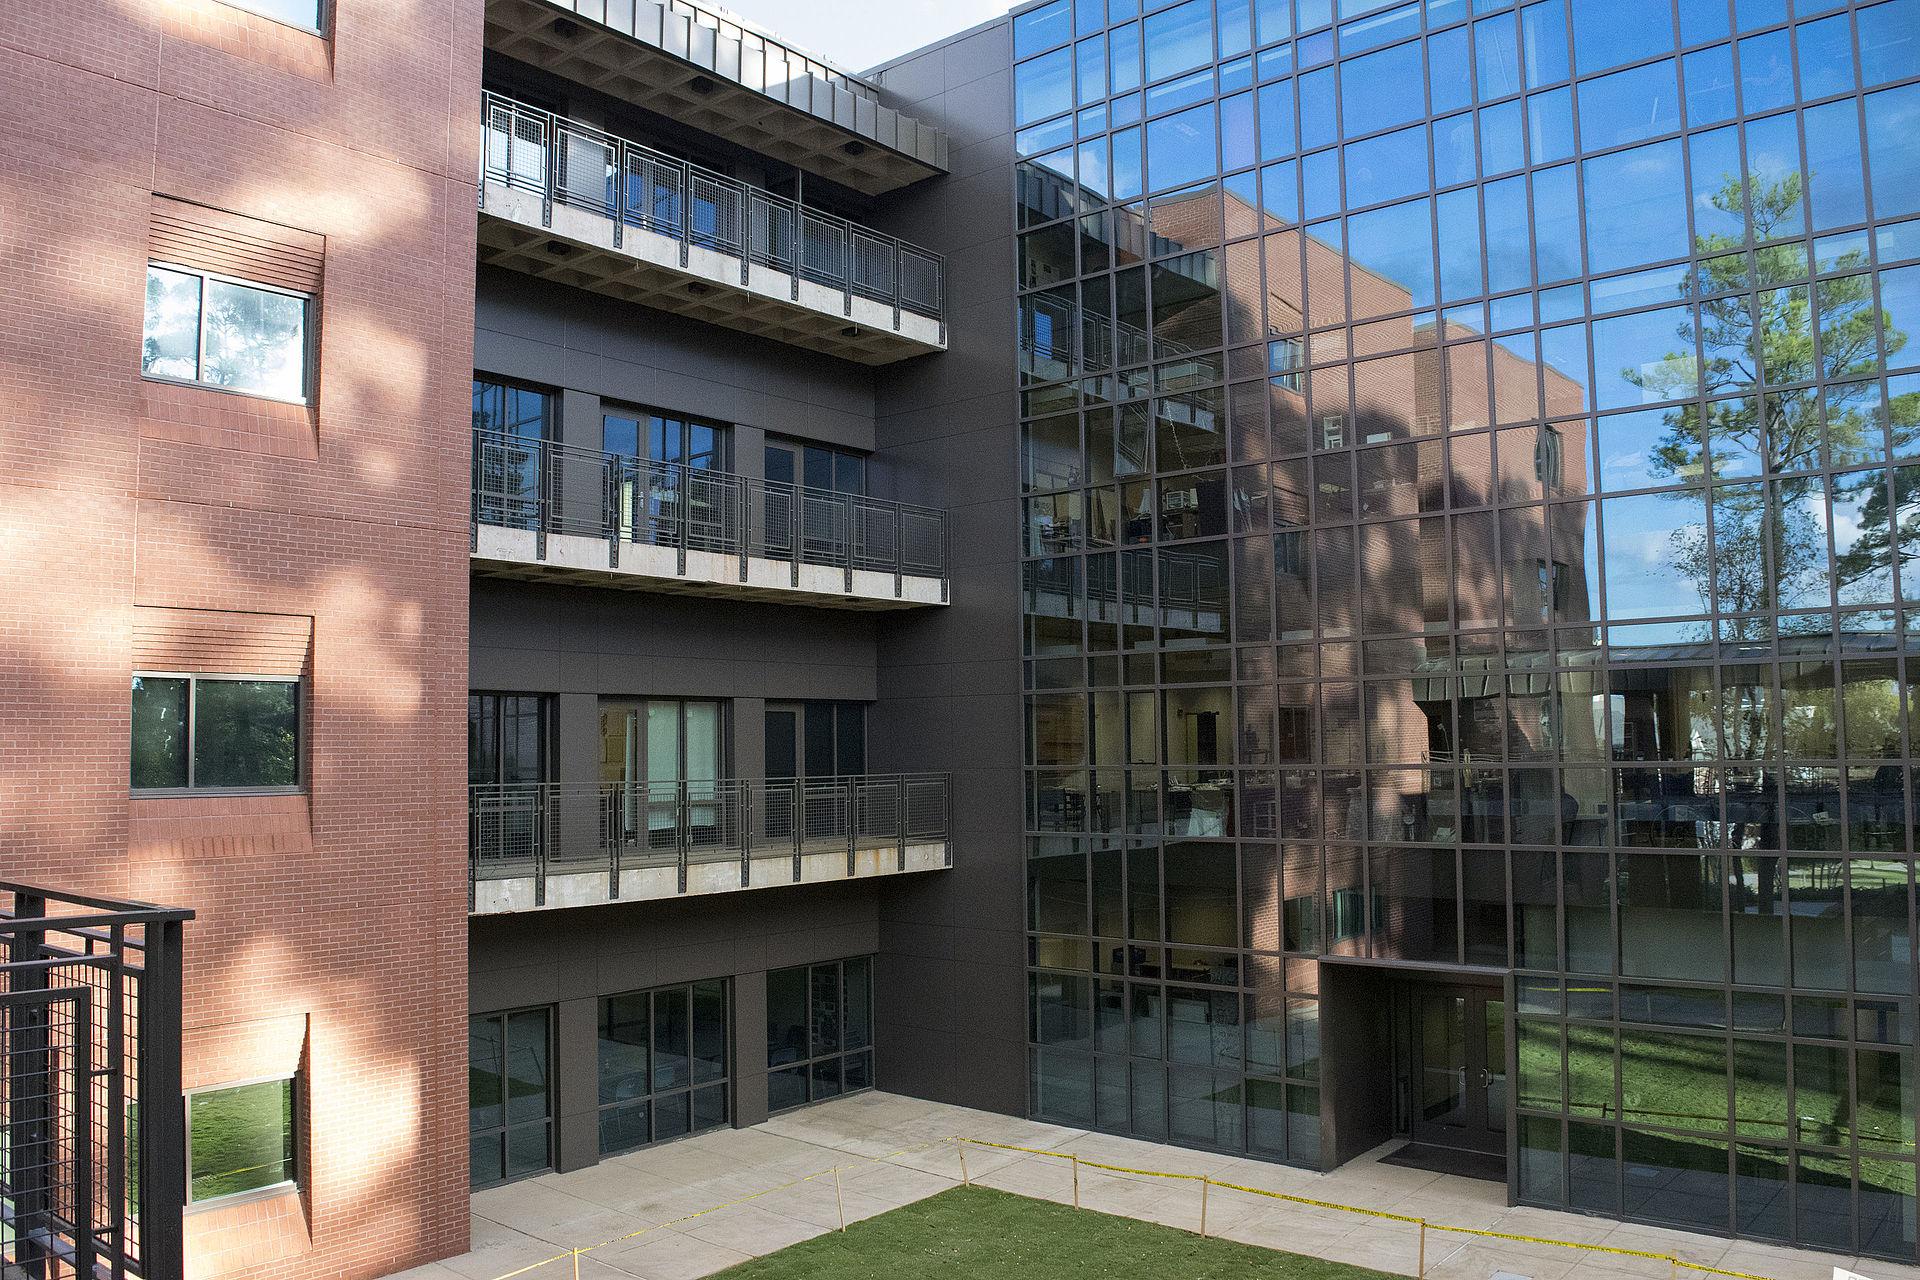 Auburn university college of architecture design and - Auburn university interior design program ...